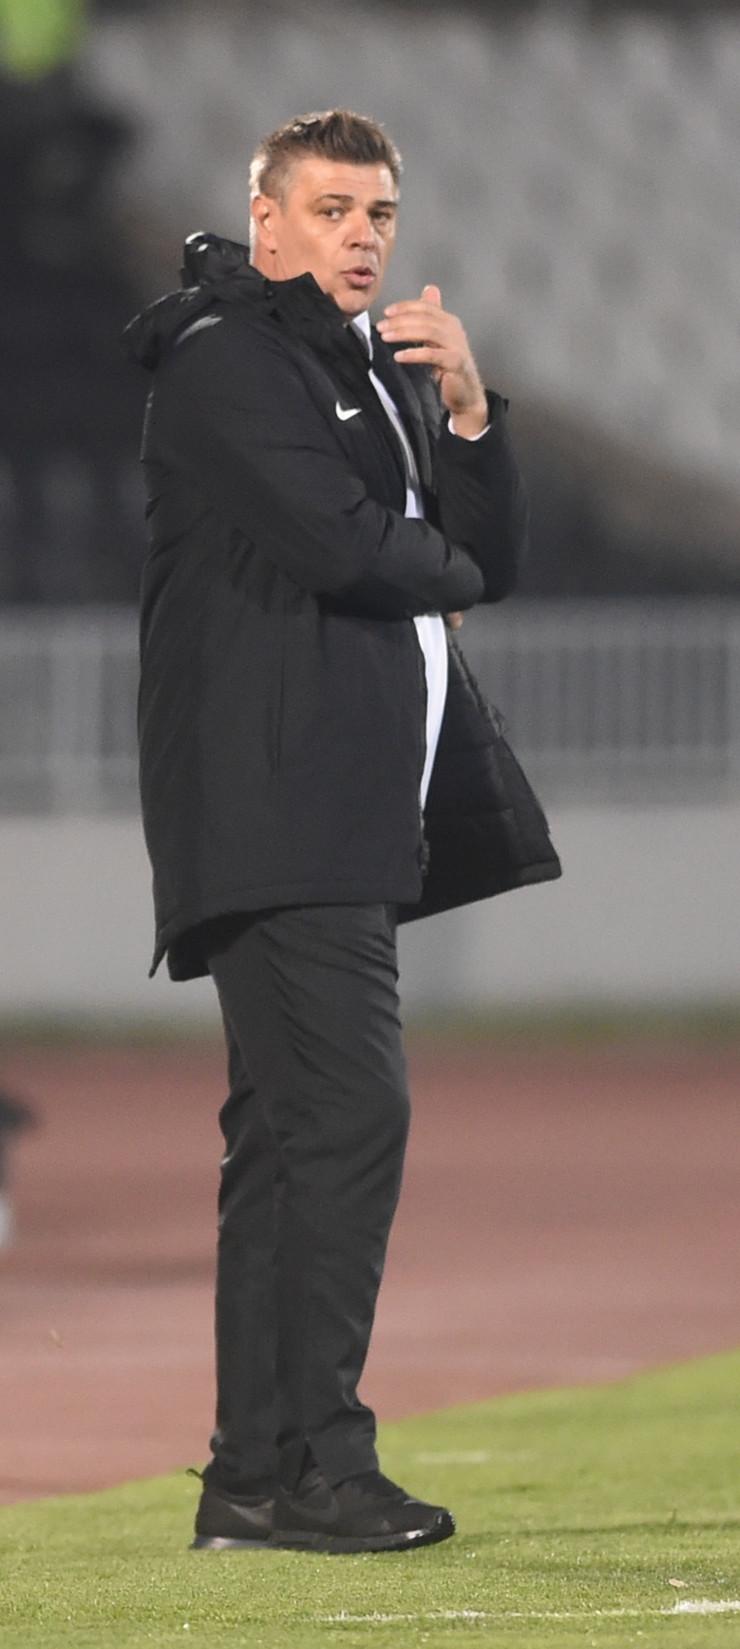 FK Partizan, FK Čukarički